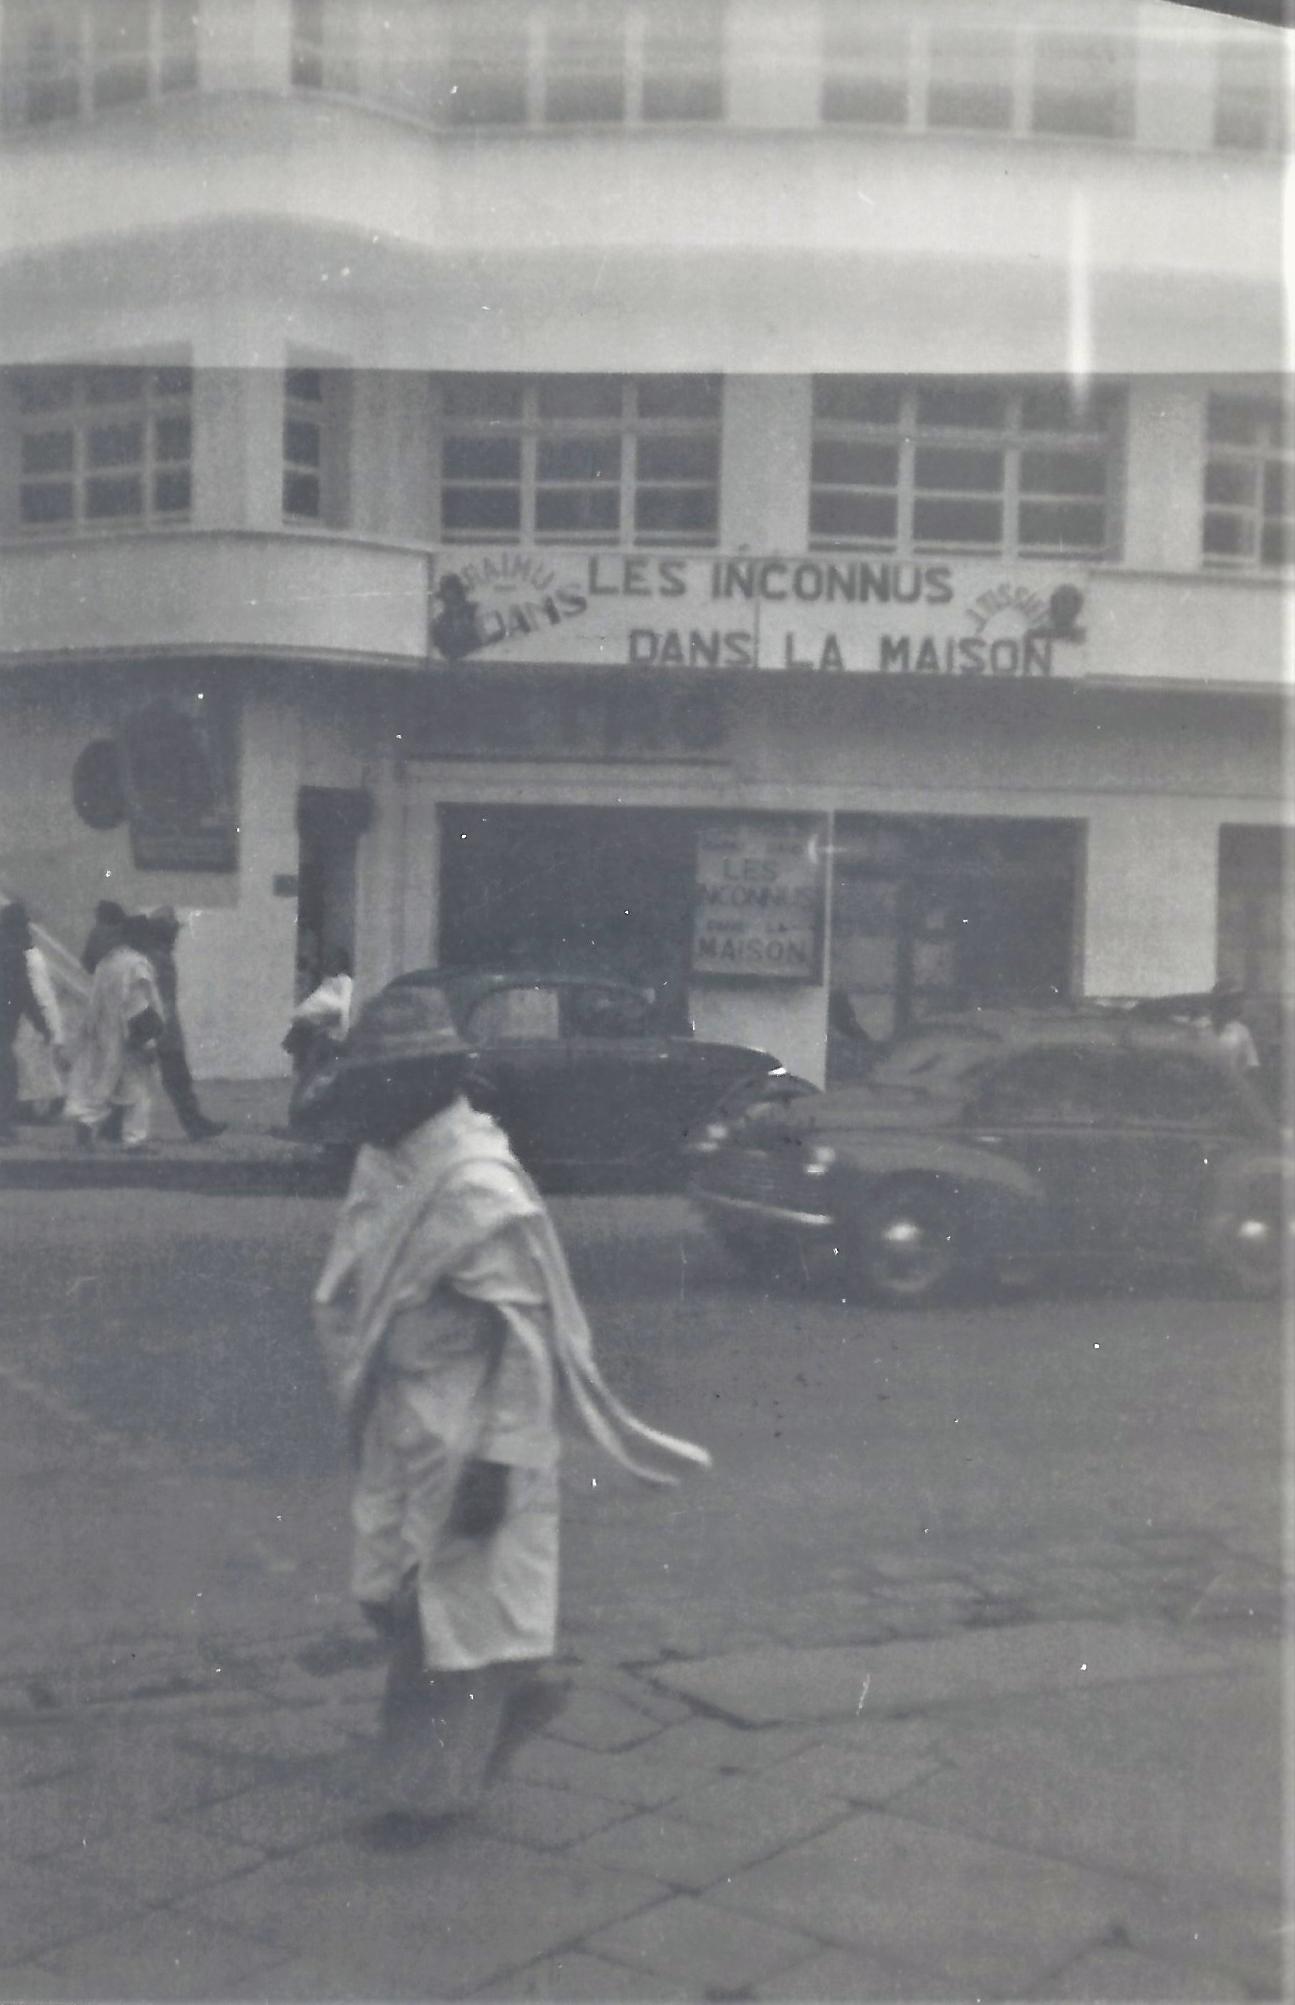 Cinéma Métro, Analakely, Tananarive